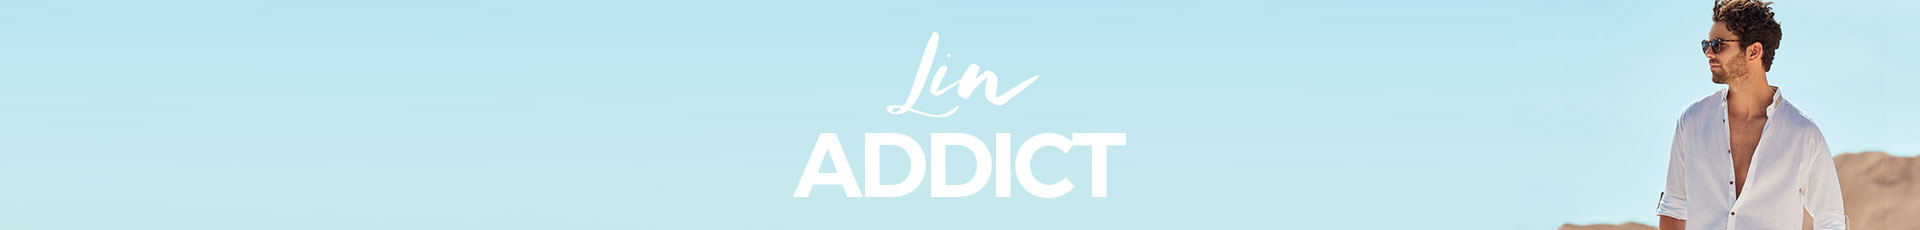 Lin addict